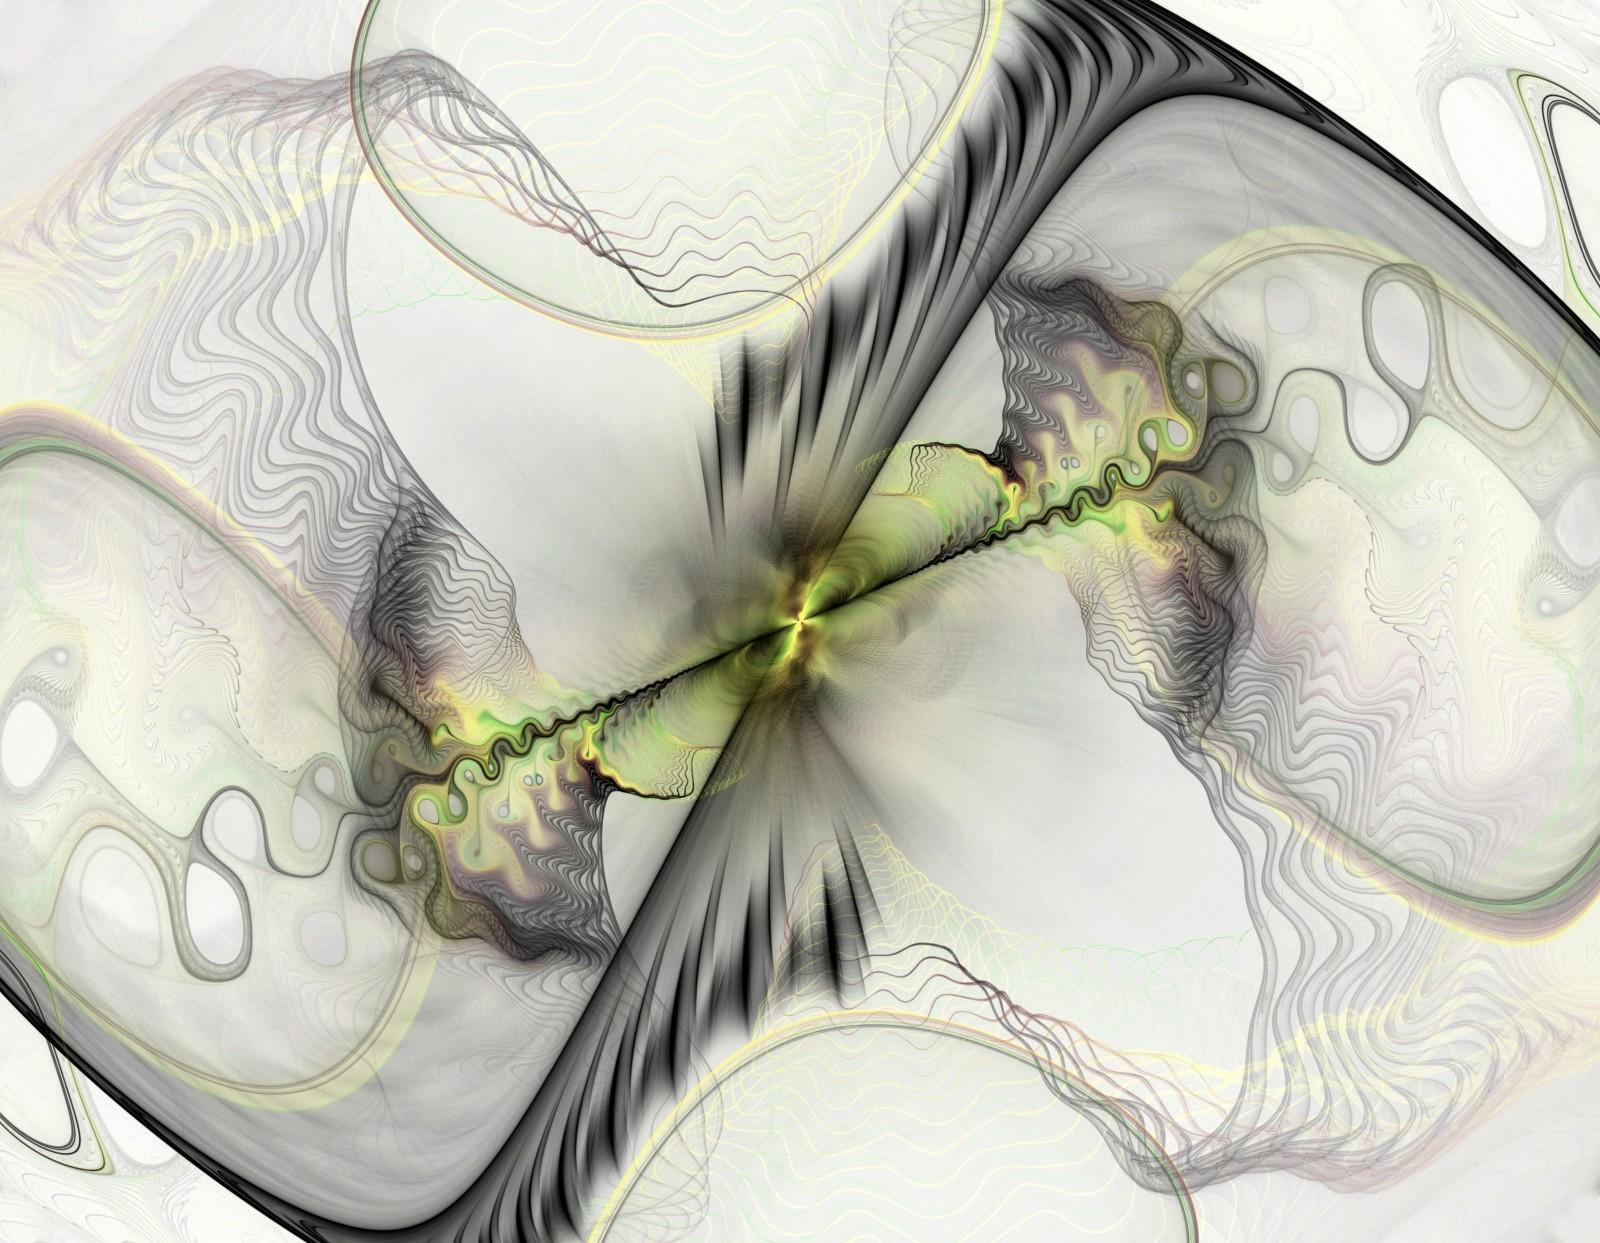 Higgs boson by eReSaW